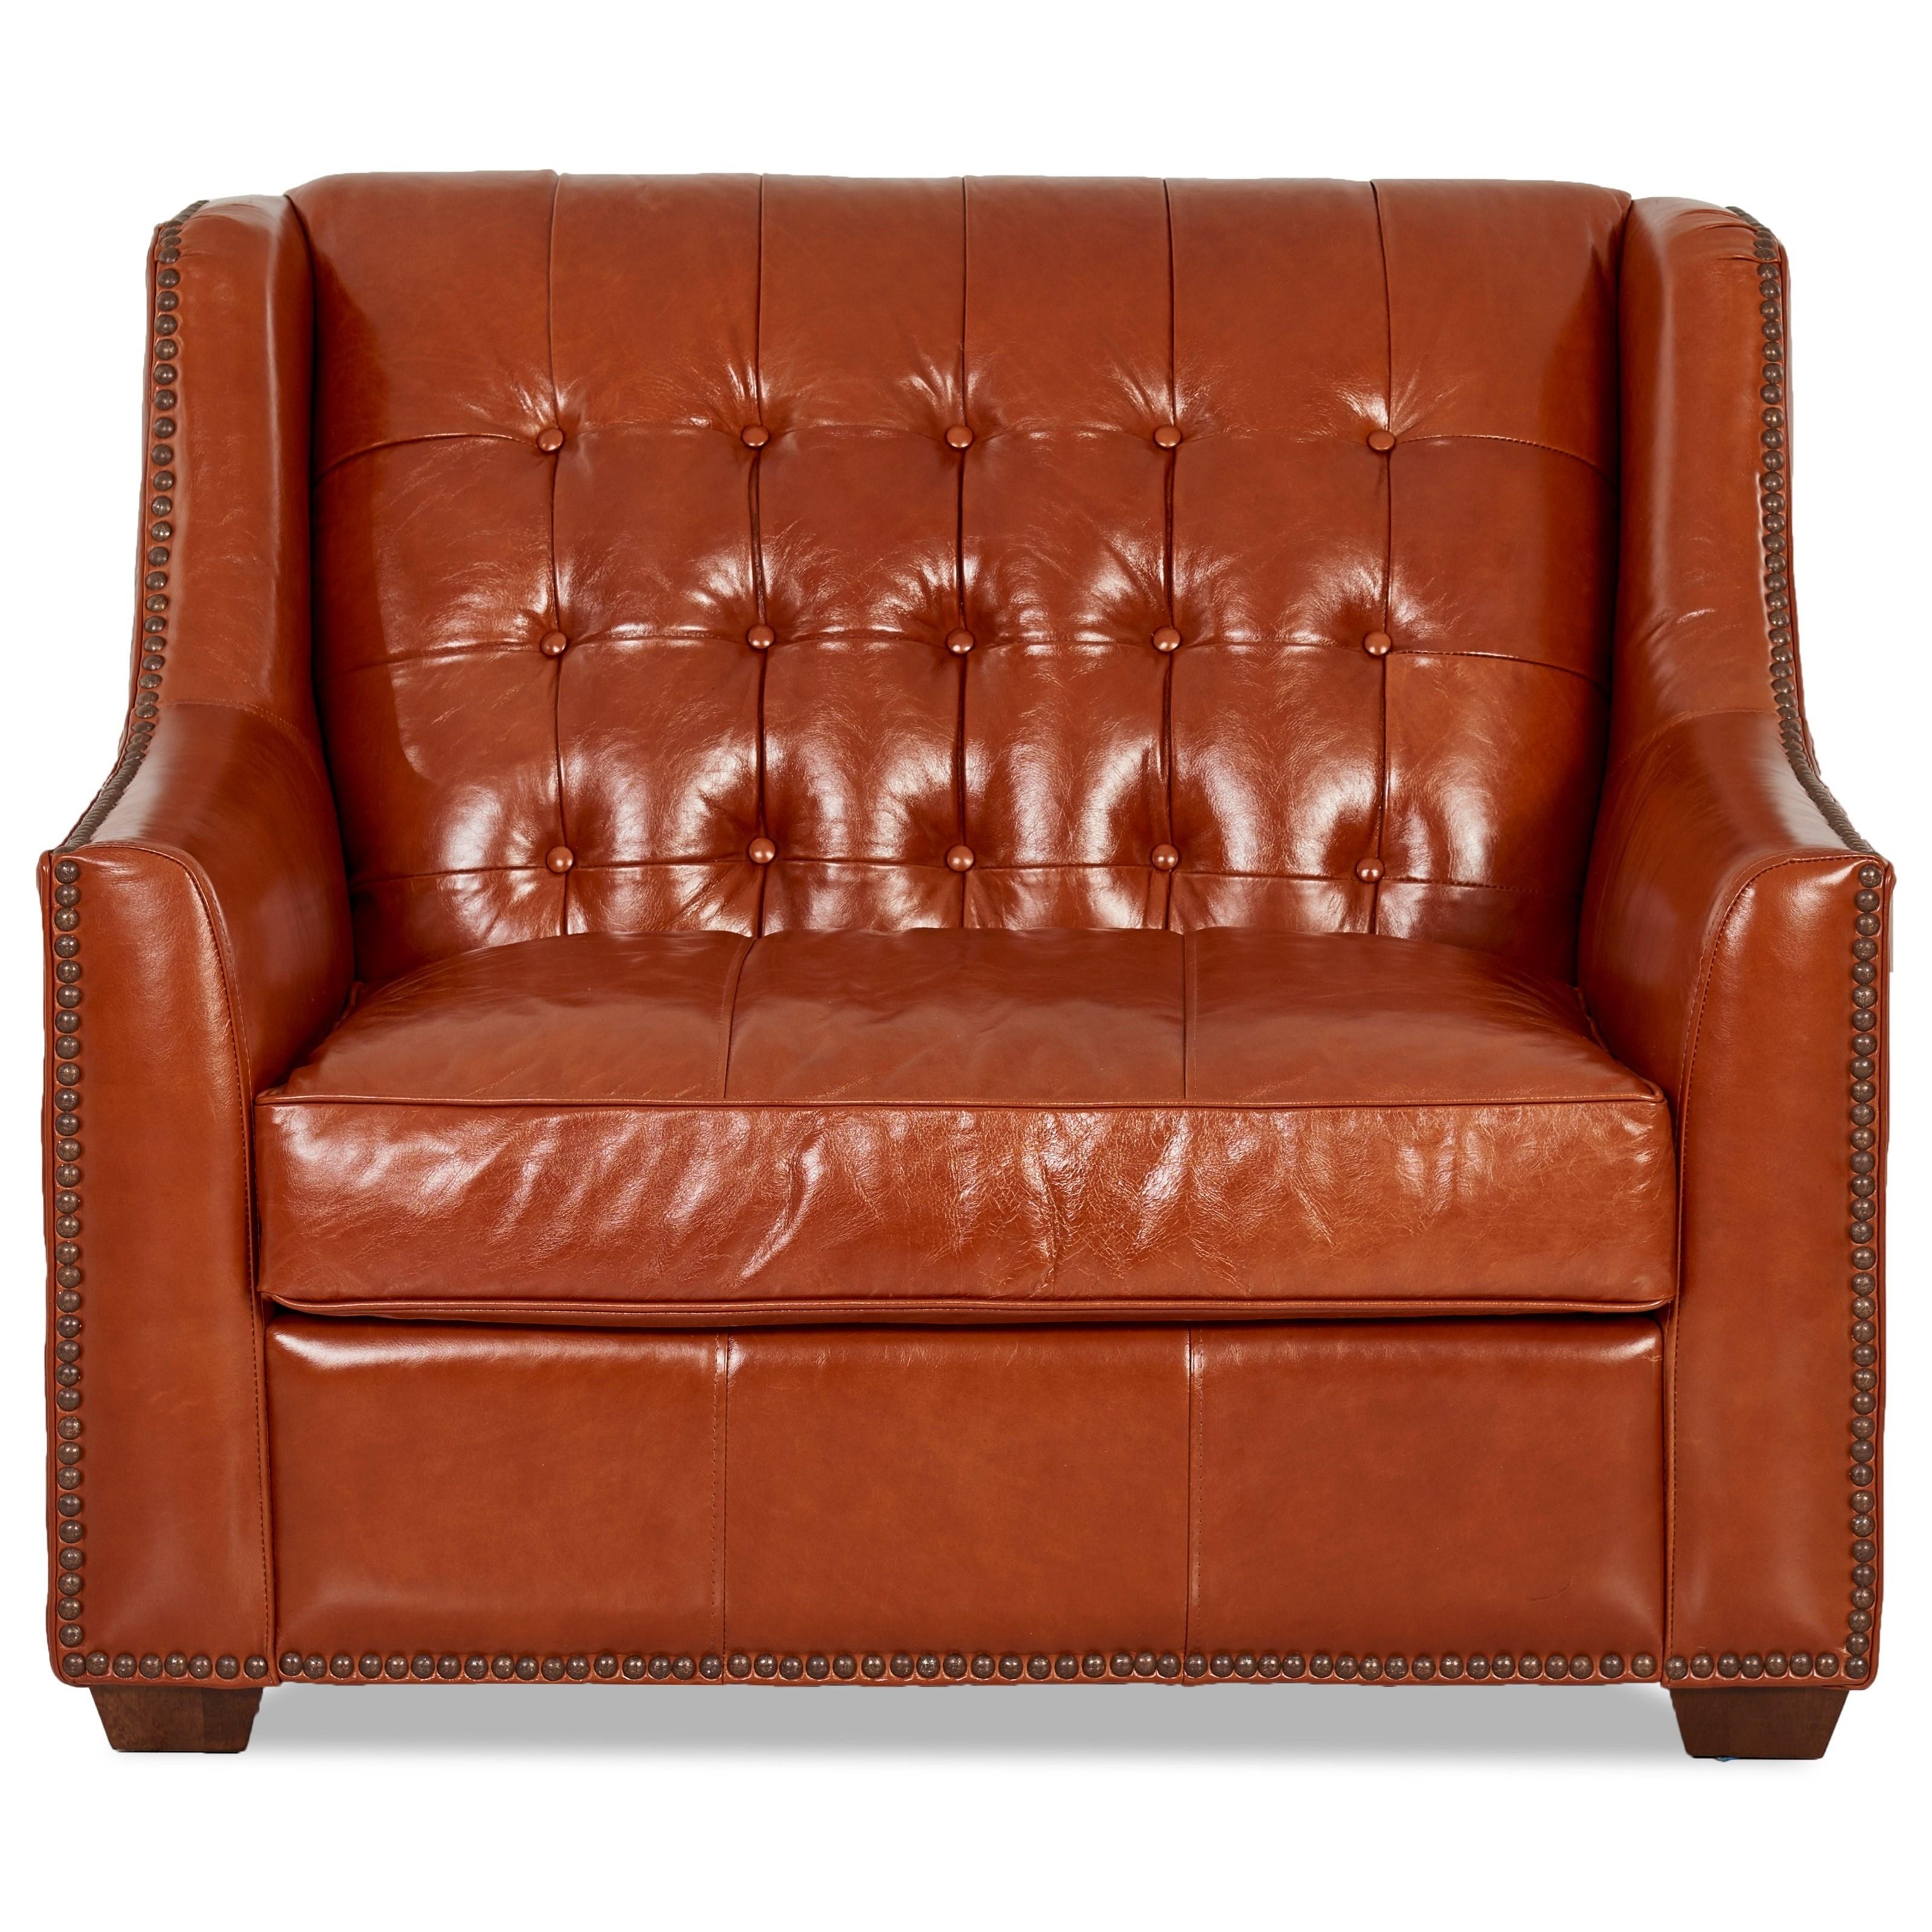 Klaussner Pennington Pennington Chair and 1/2 - Item Number: LD58510 BC